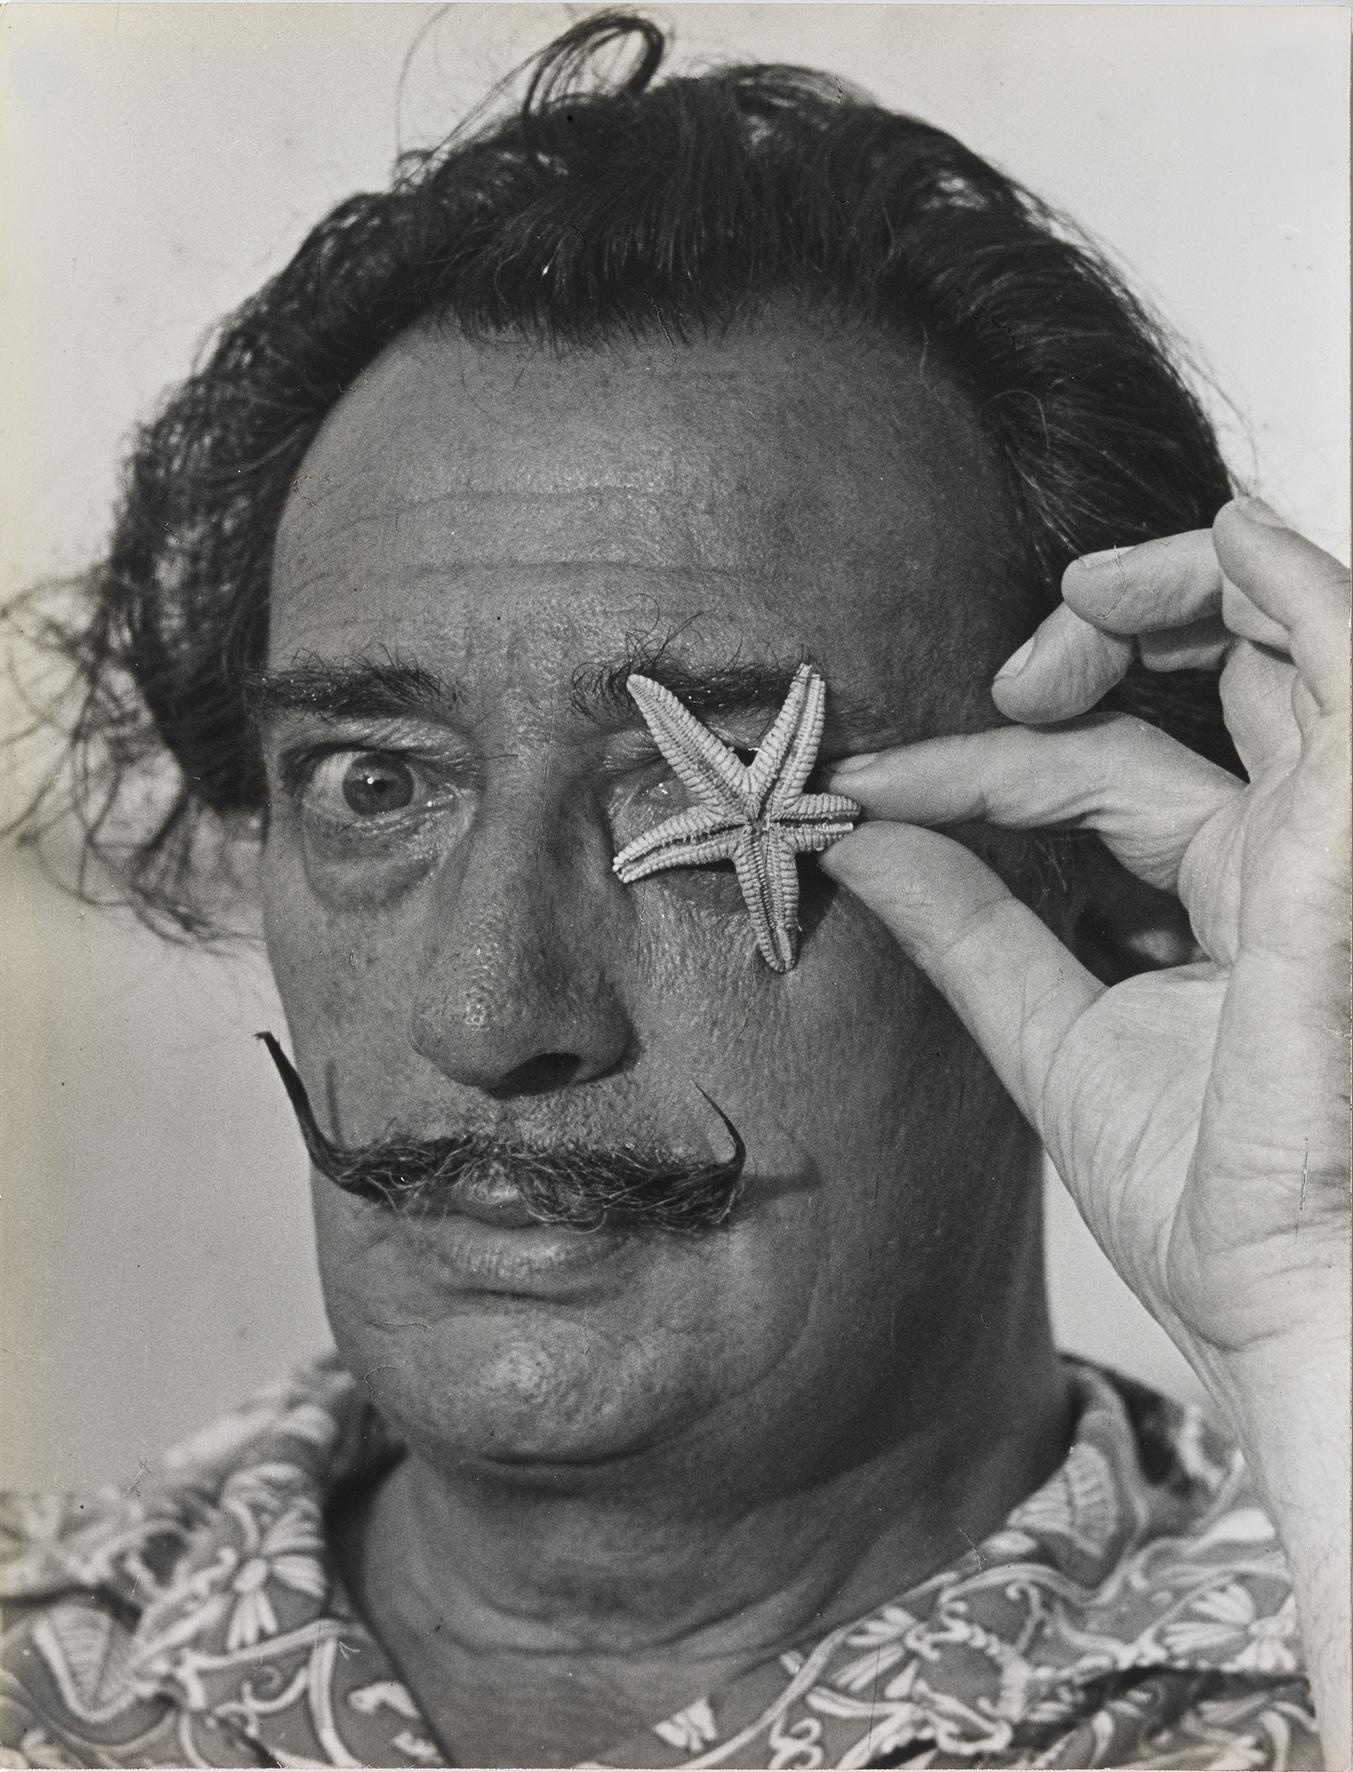 © X. Miserachs/Fundació Gala-Salvador Dalí, Figueres, 2016. Image Rights of Salvador Dalí reserved. Fundació Gala-Salvador Dalí, Figueres, 2016.